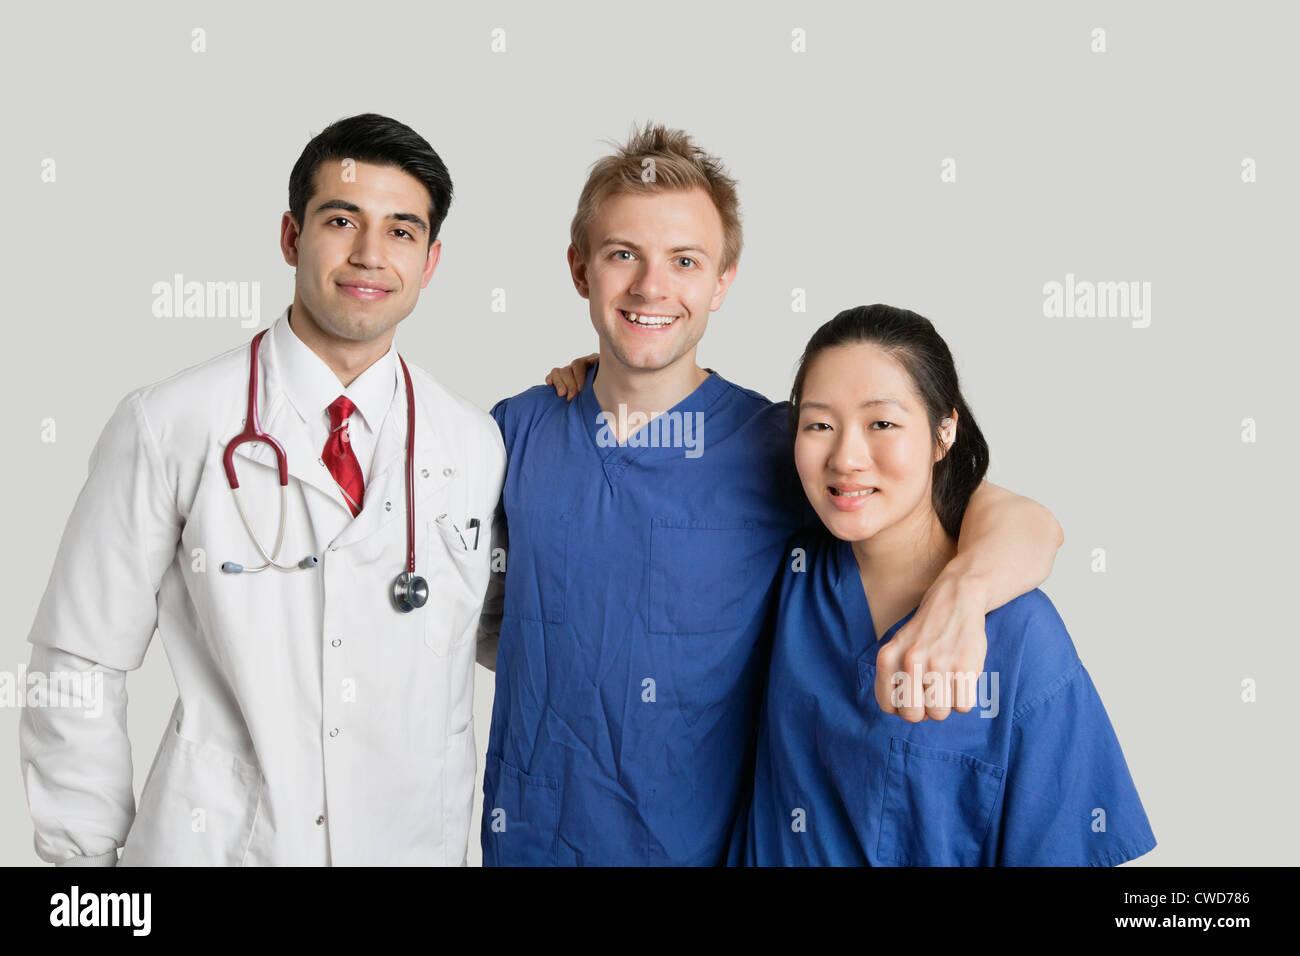 Retrato de simpático equipo médico parado sobre fondo gris Imagen De Stock